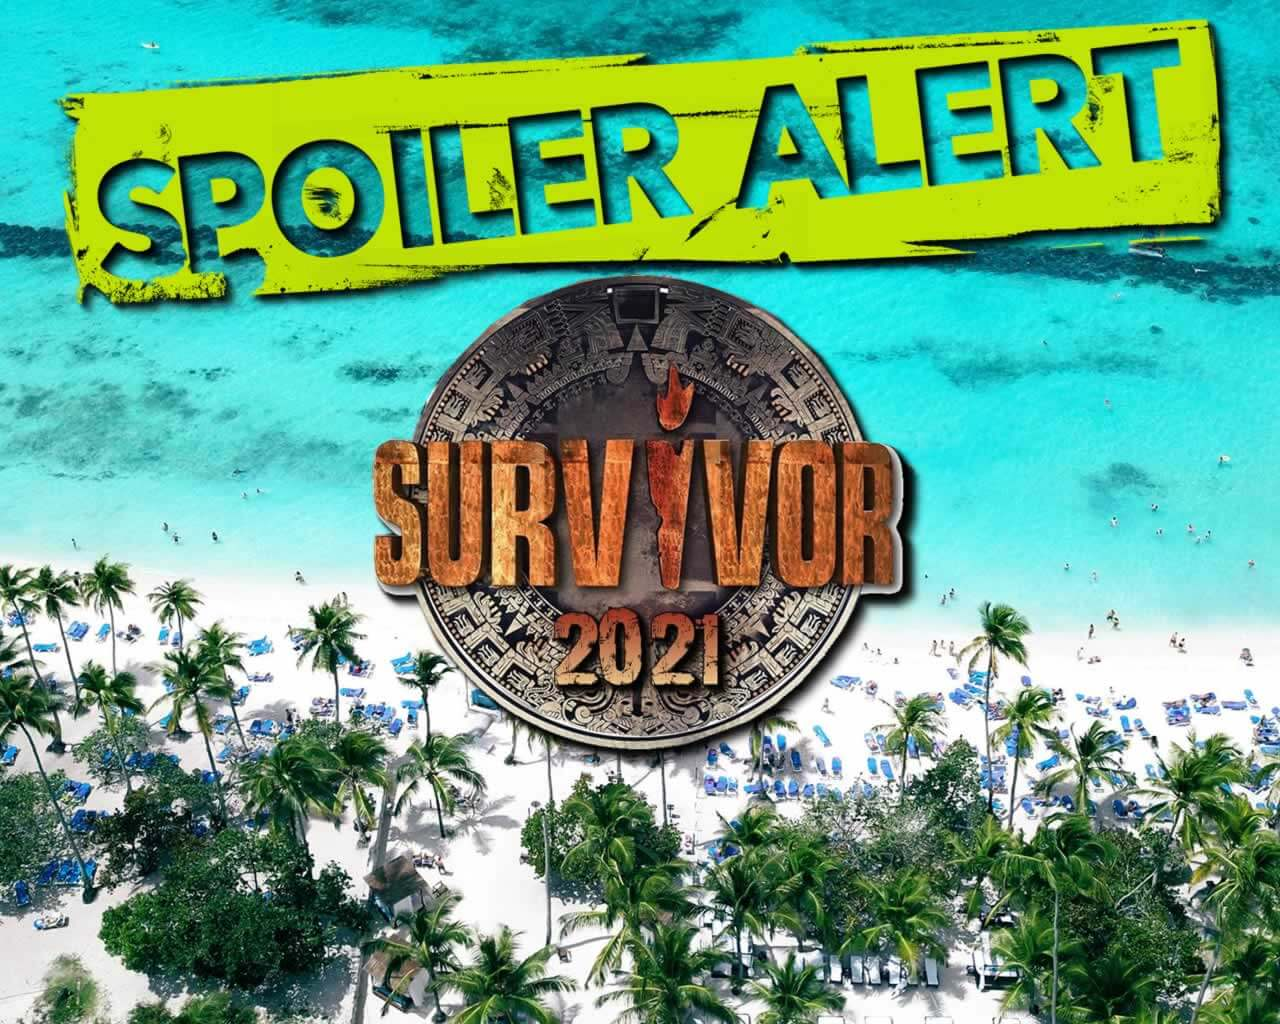 Survivor spoiler,survivor spoiler,survivor spoiler σημερα,survivor spoiler 31 1,survivor spoiler υποψηφιοι,survivor spoiler ασυλια,survivor spoilers,survivor spoiler κυριακη,survivor spoiler ποιοσ κερδιζει,